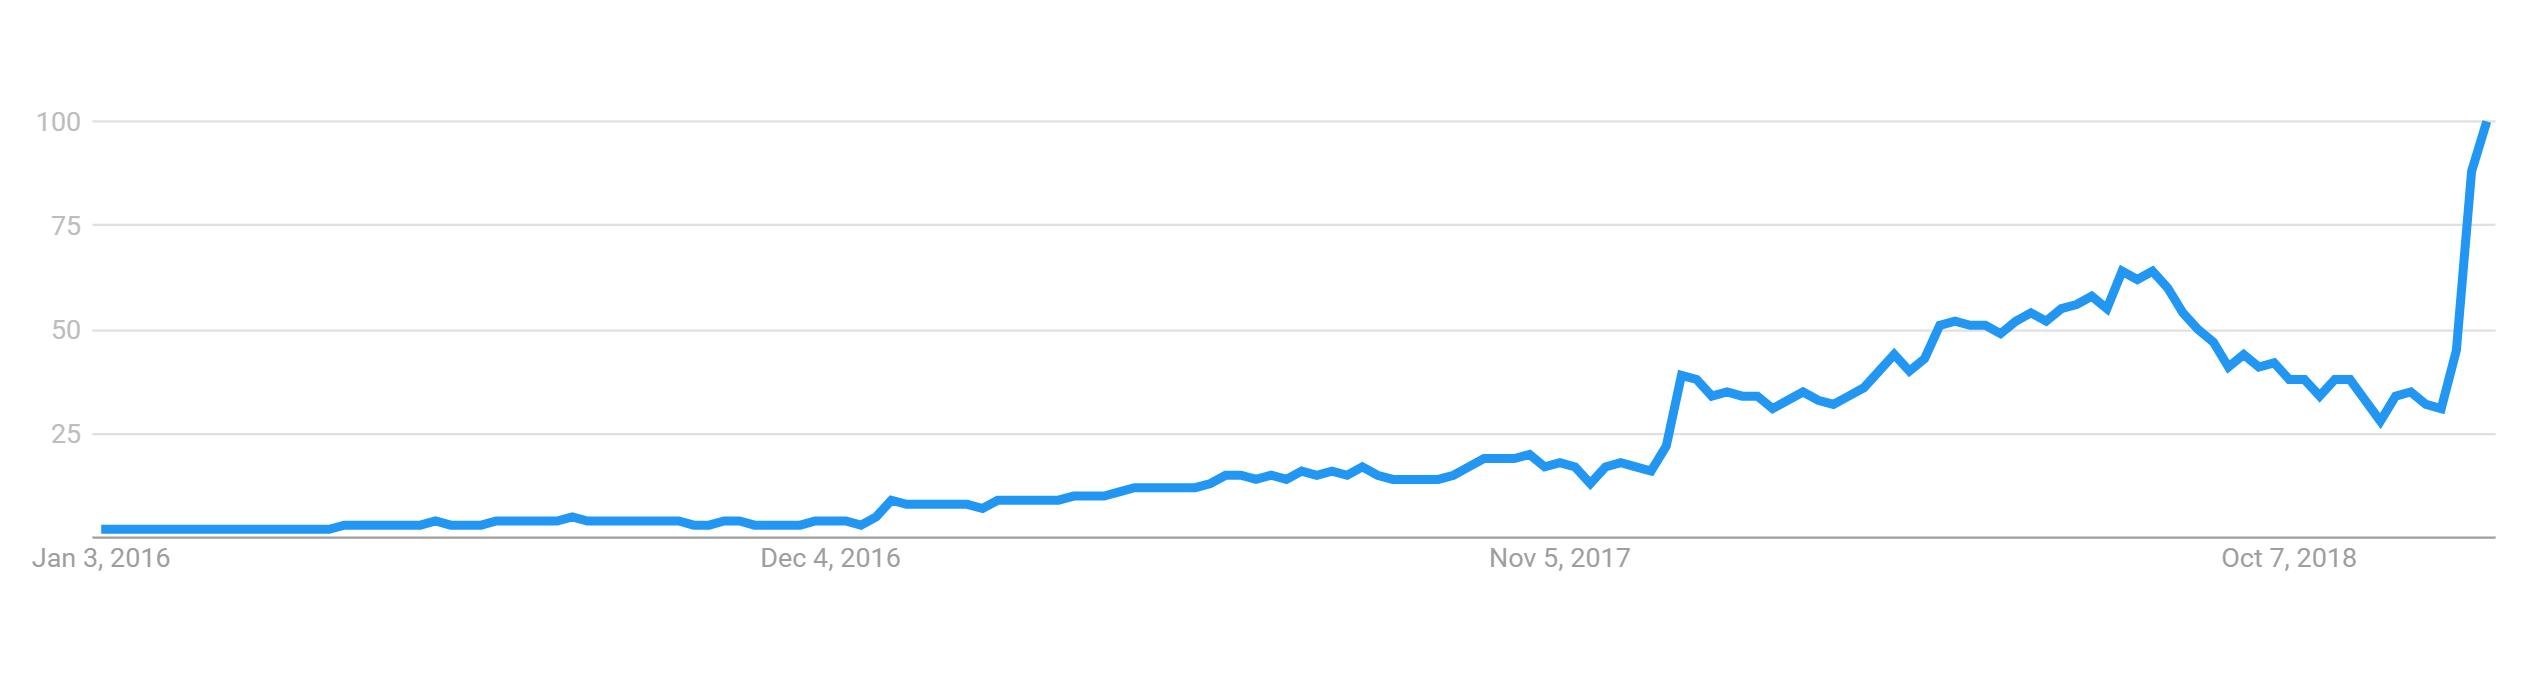 Google Trends data for the term 'keto diet'